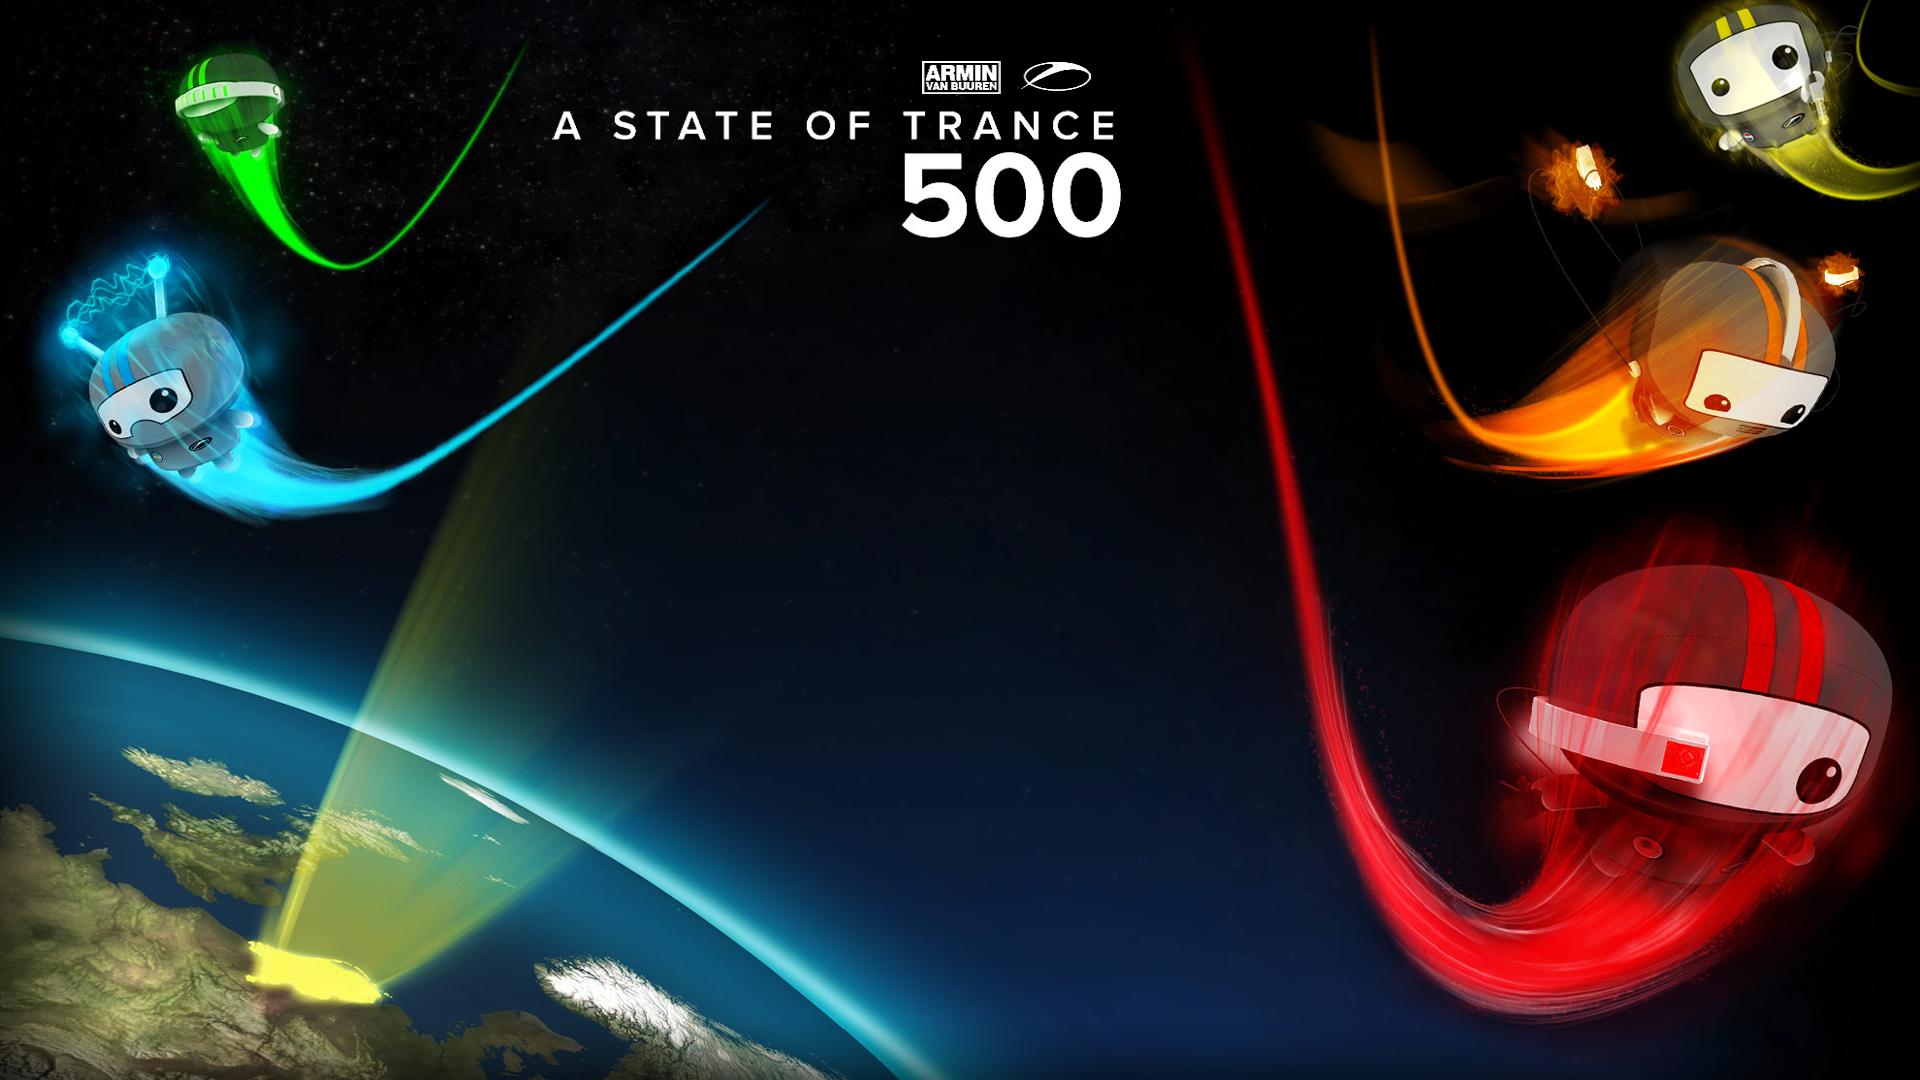 State of Trance 500 by xmynox 1920x1080